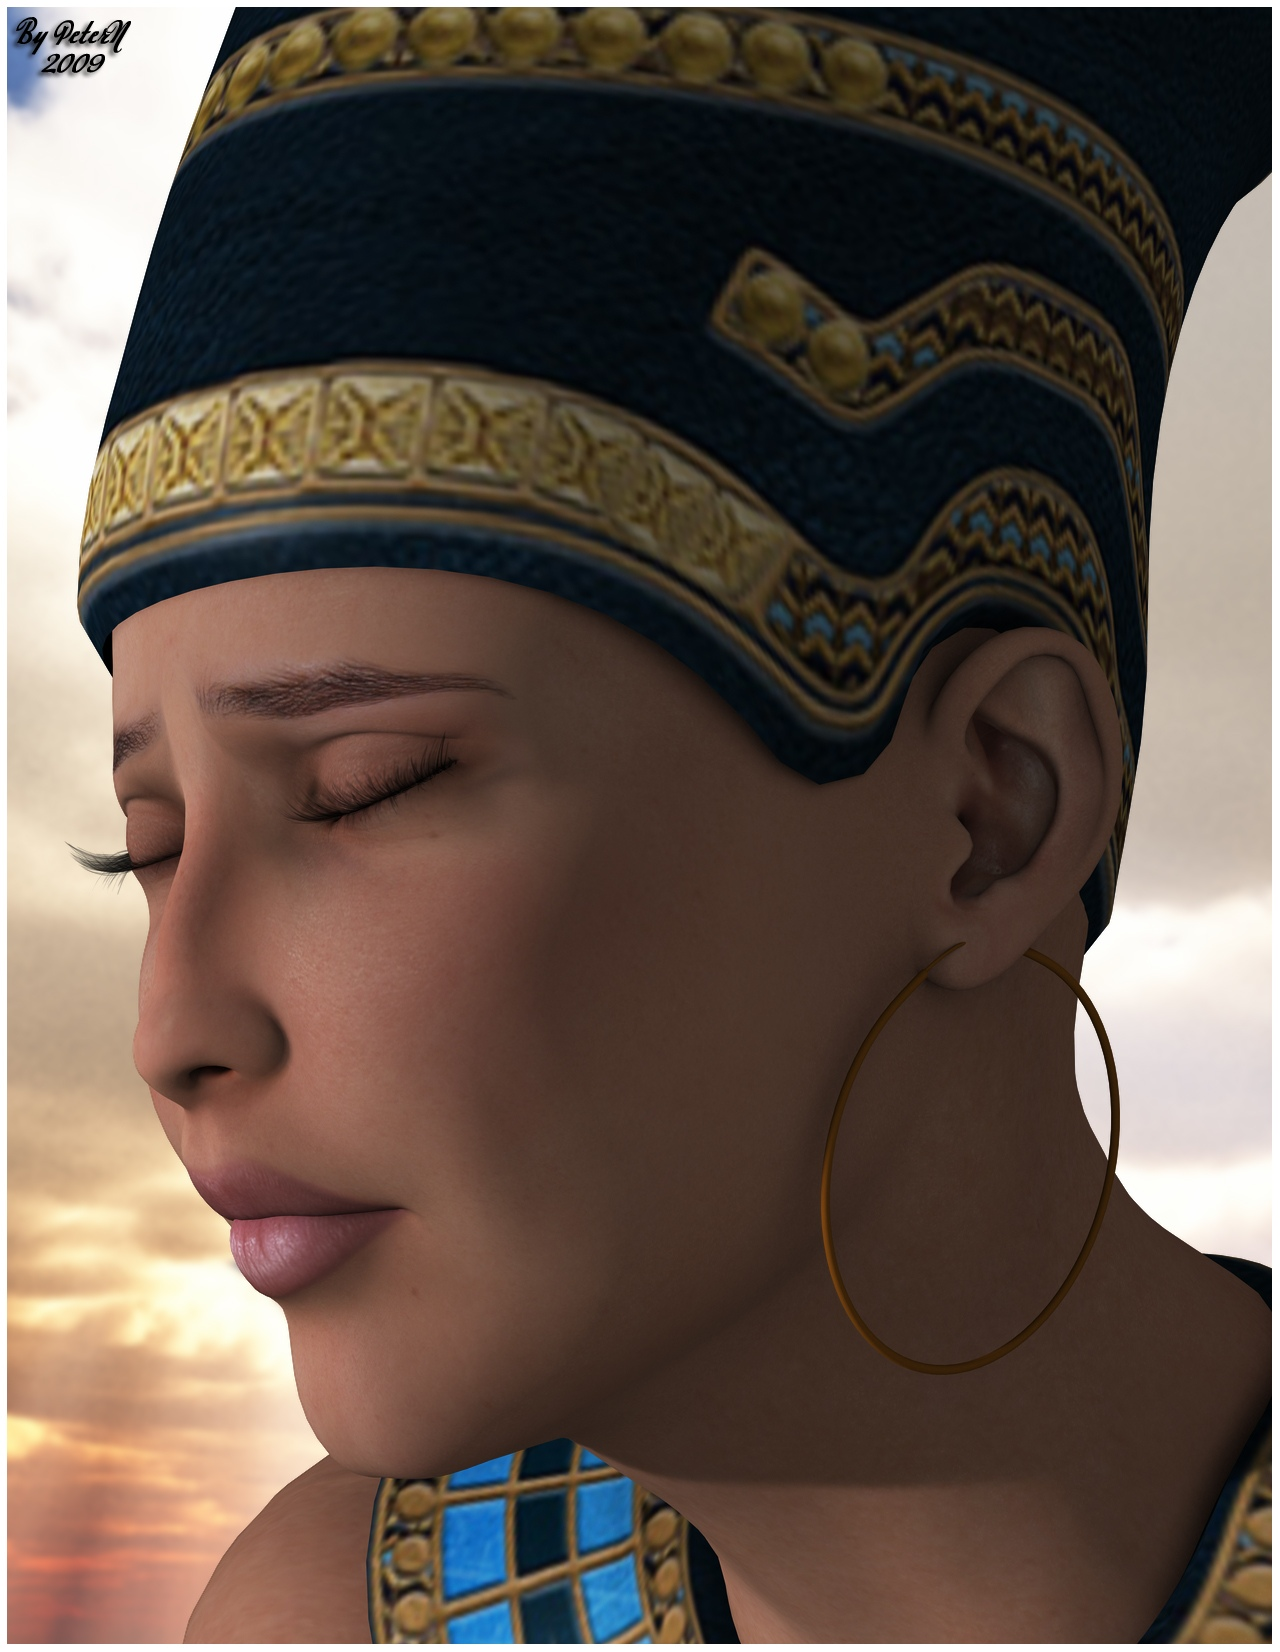 http://fc09.deviantart.net/fs29/f/2009/247/c/c/White_Nefertiti_by_PeterN64.jpg